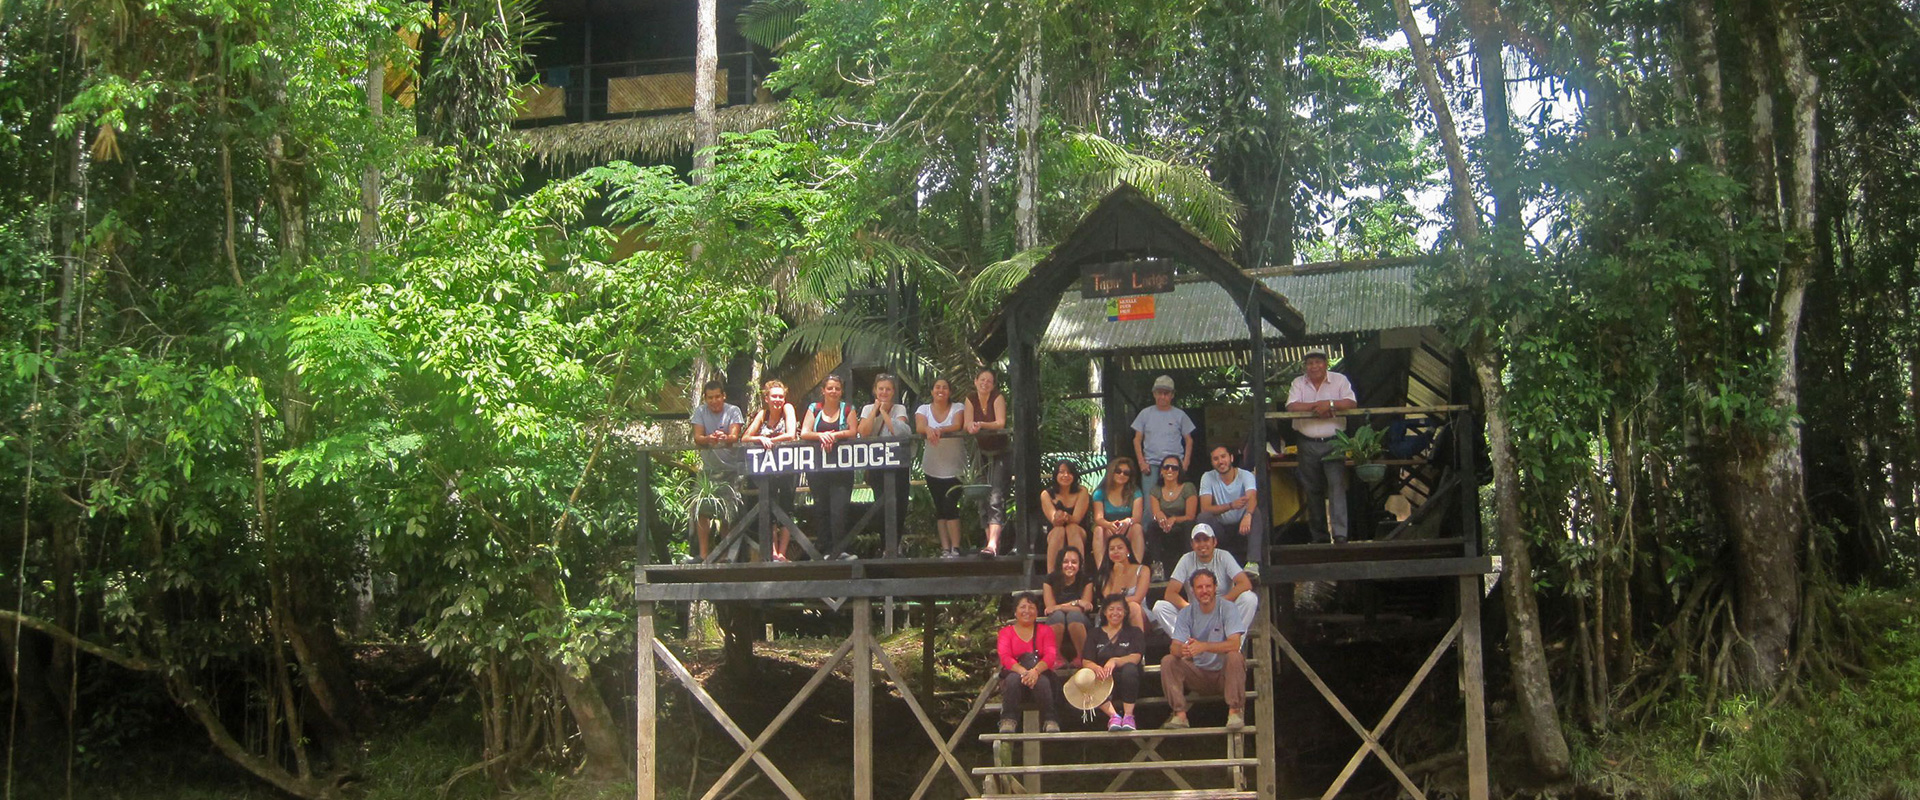 Tapir Lodge Amazon Ecuador